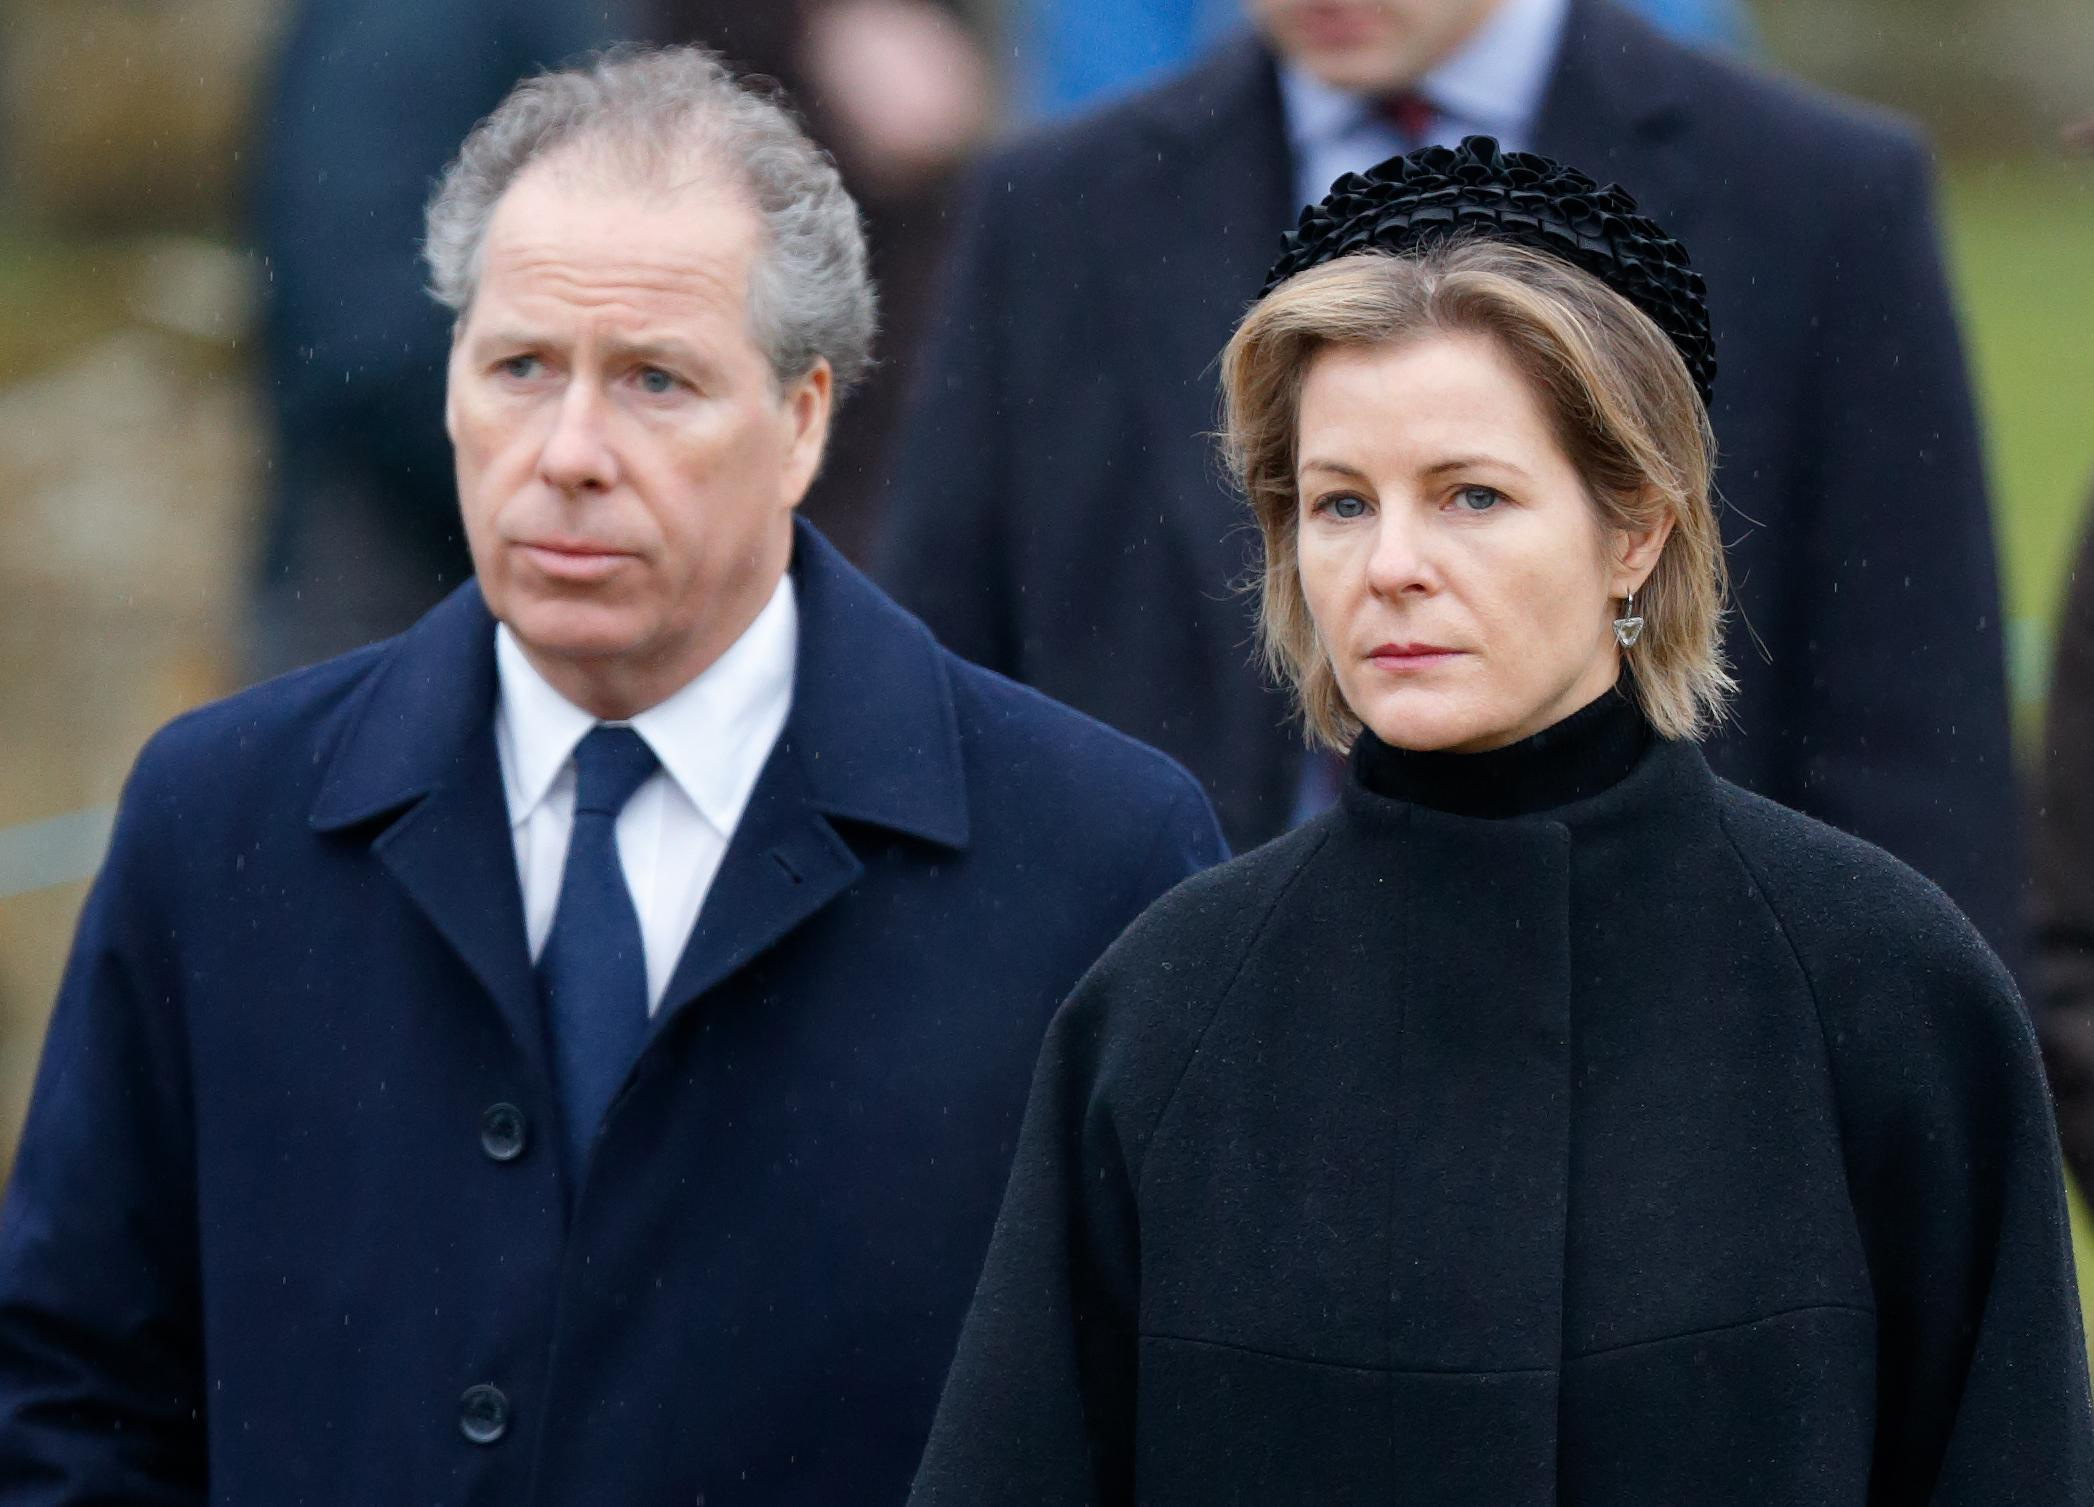 Queen's nephew Earl of Snowdon announces 'amicable divorce'